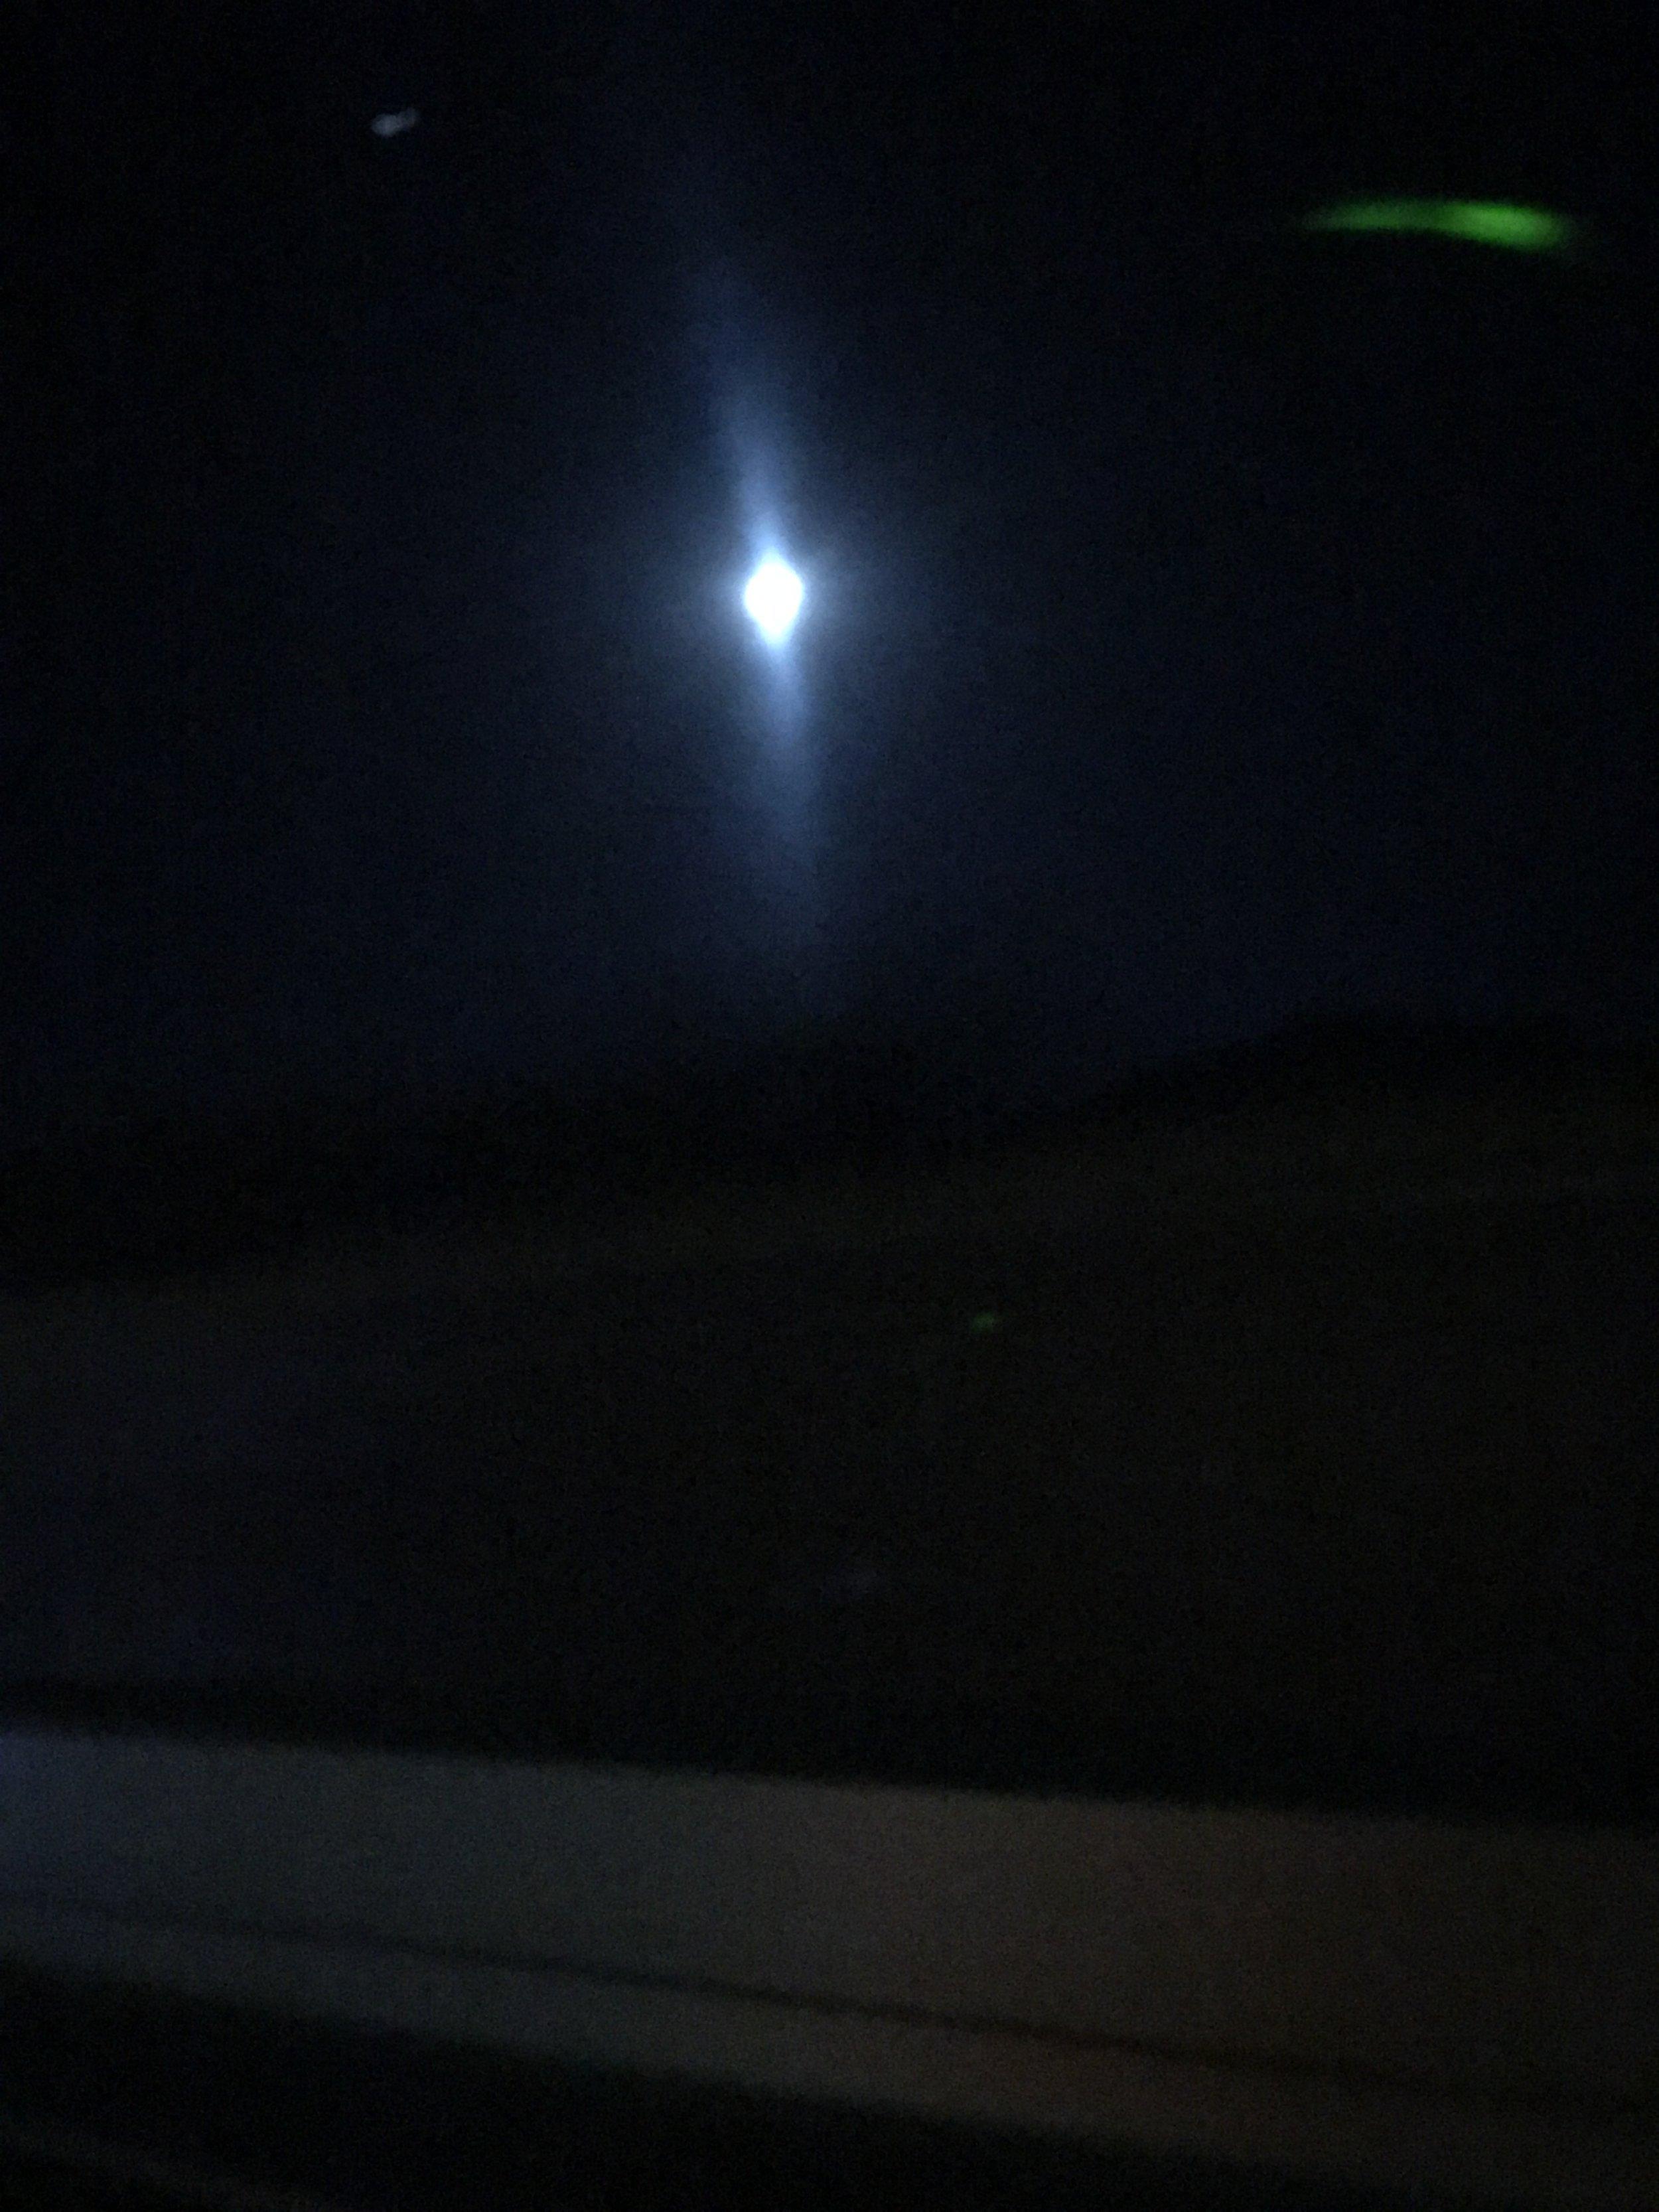 On my way to La Serena- the Moon!